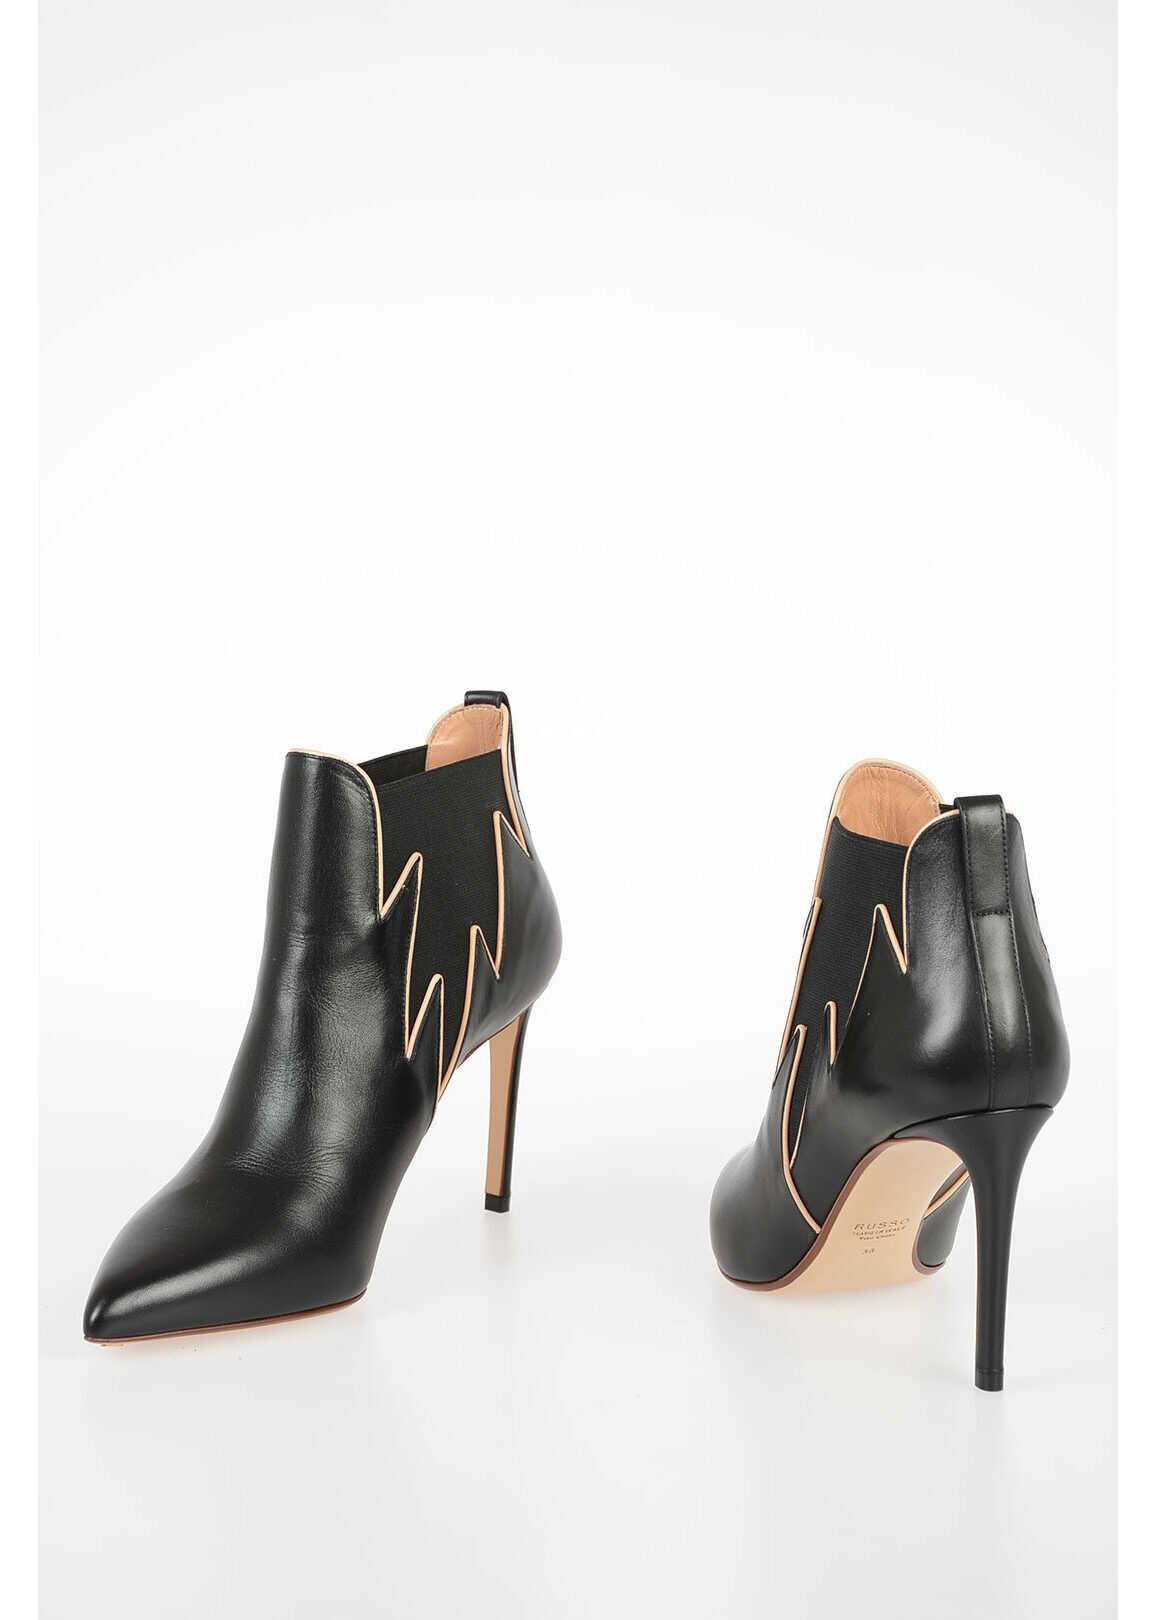 Francesco Russo 9,5cm Leather Ankle Boots BLACK